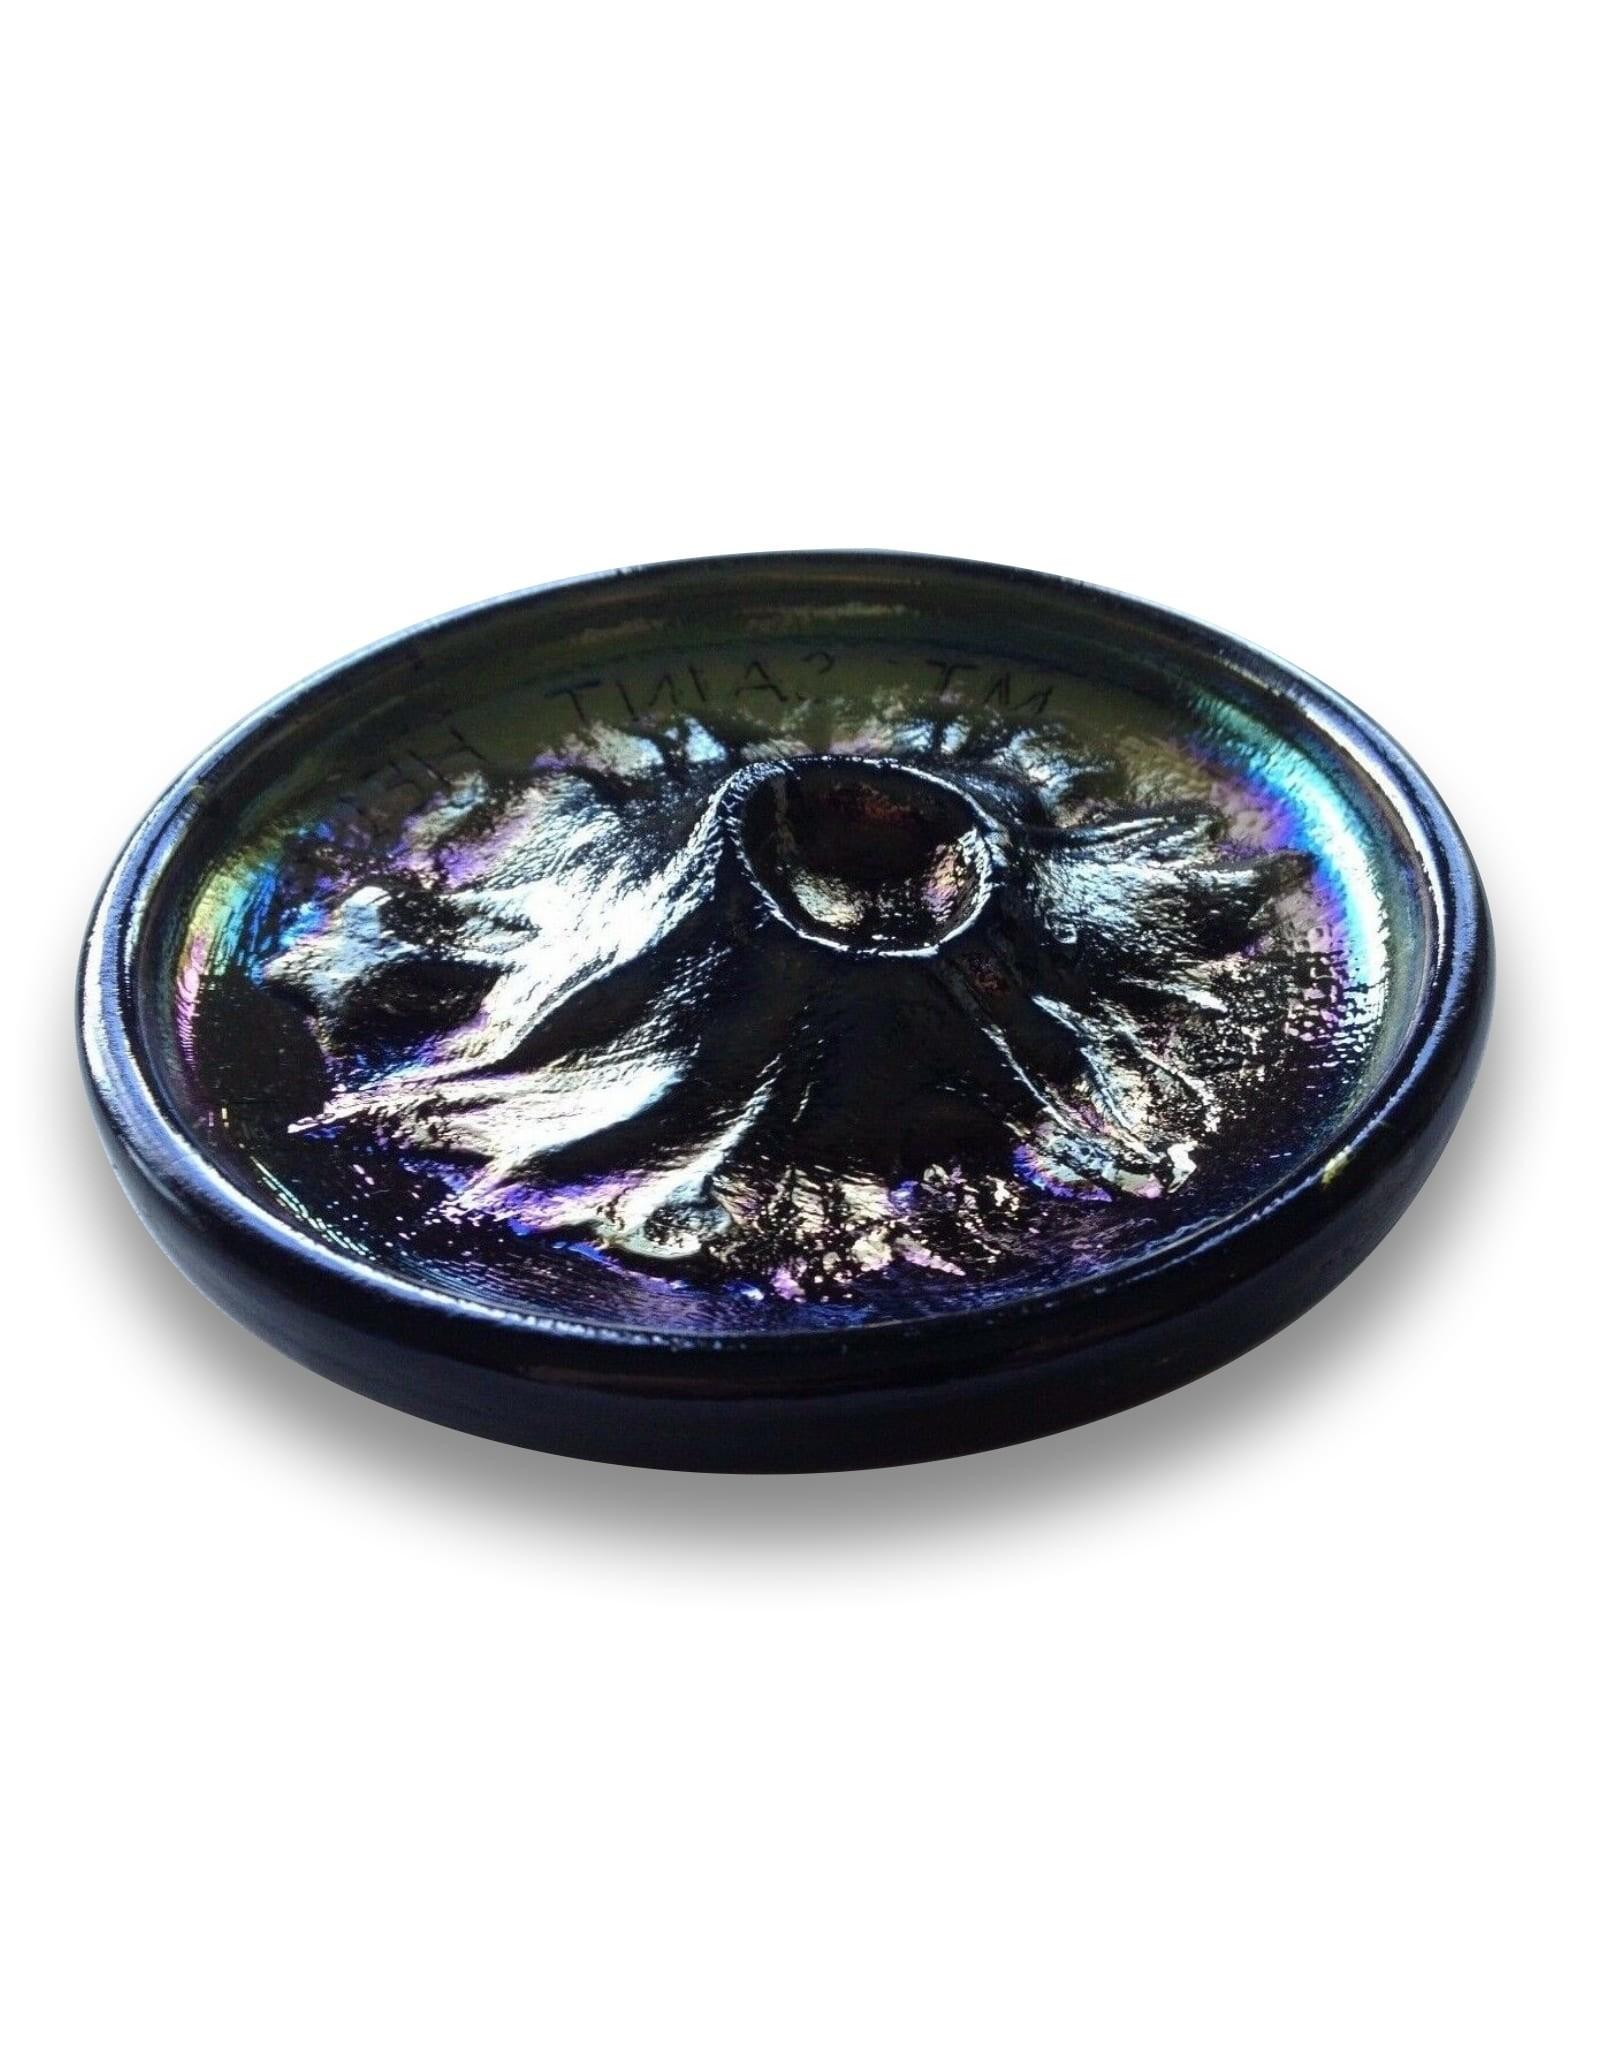 Volcanic Ash Dish